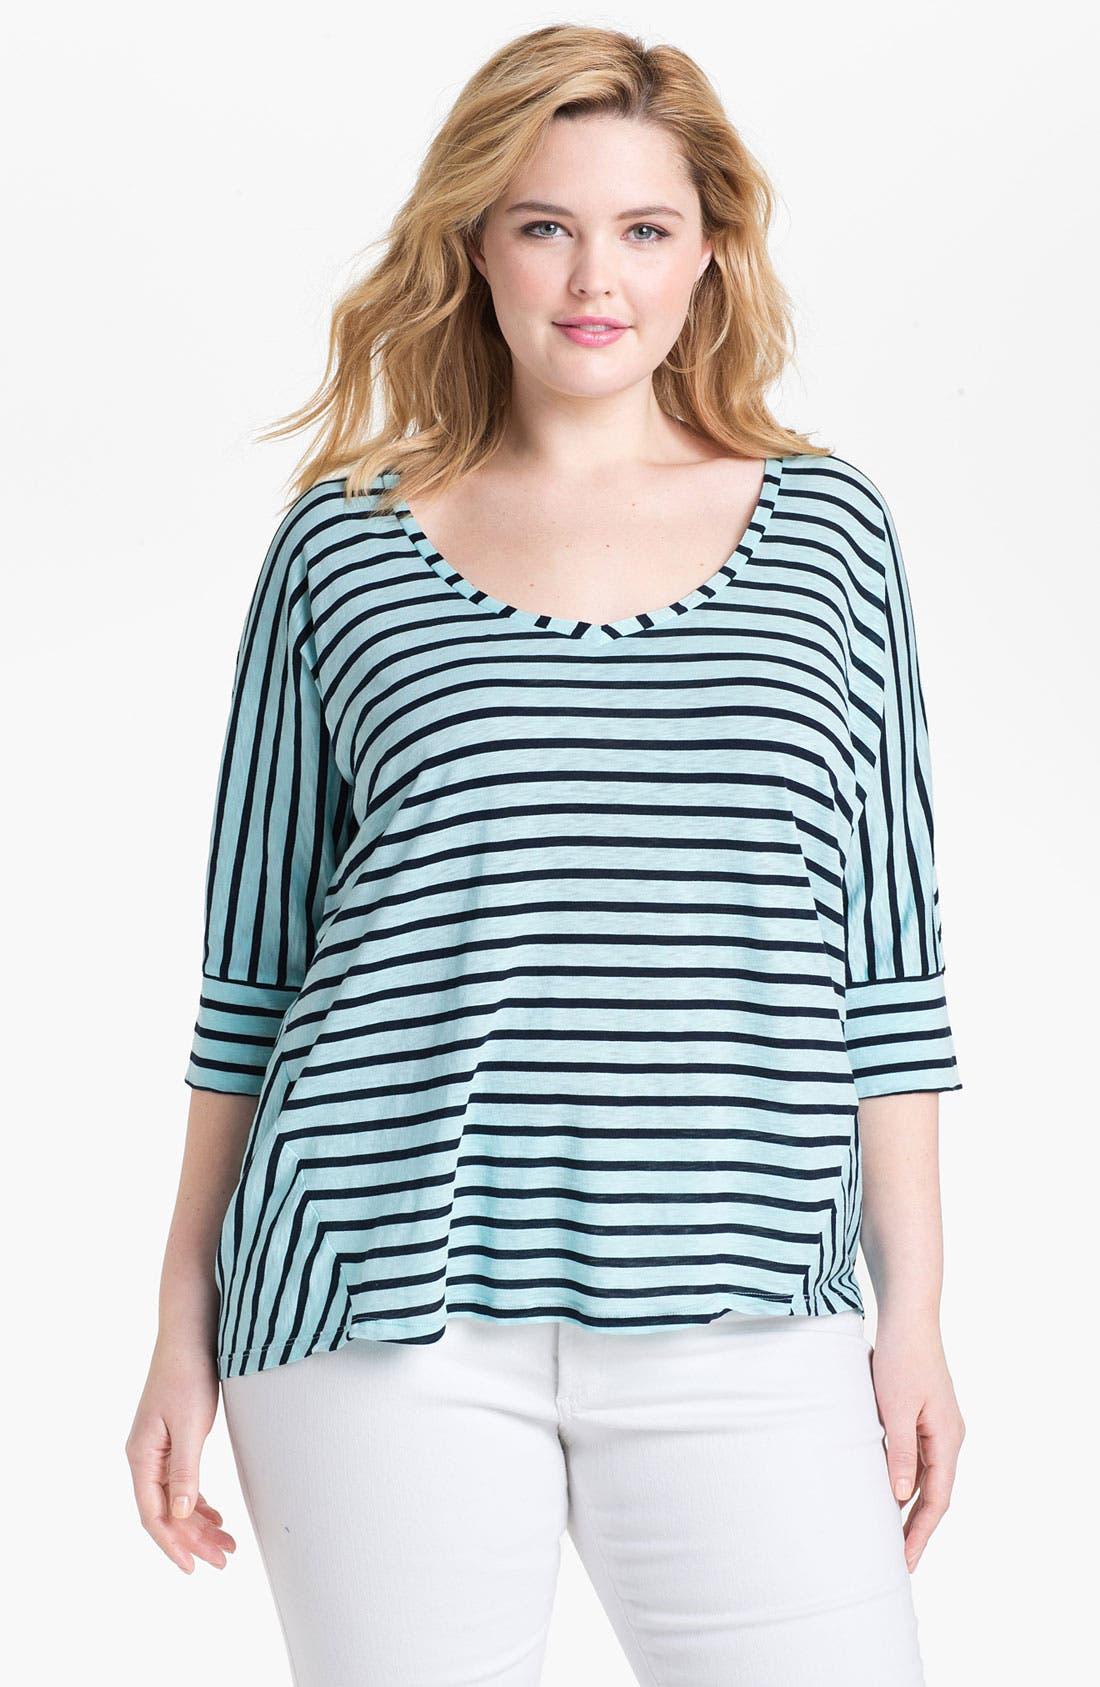 Main Image - Splendid 'Miami' Stripe Cotton Top (Plus)